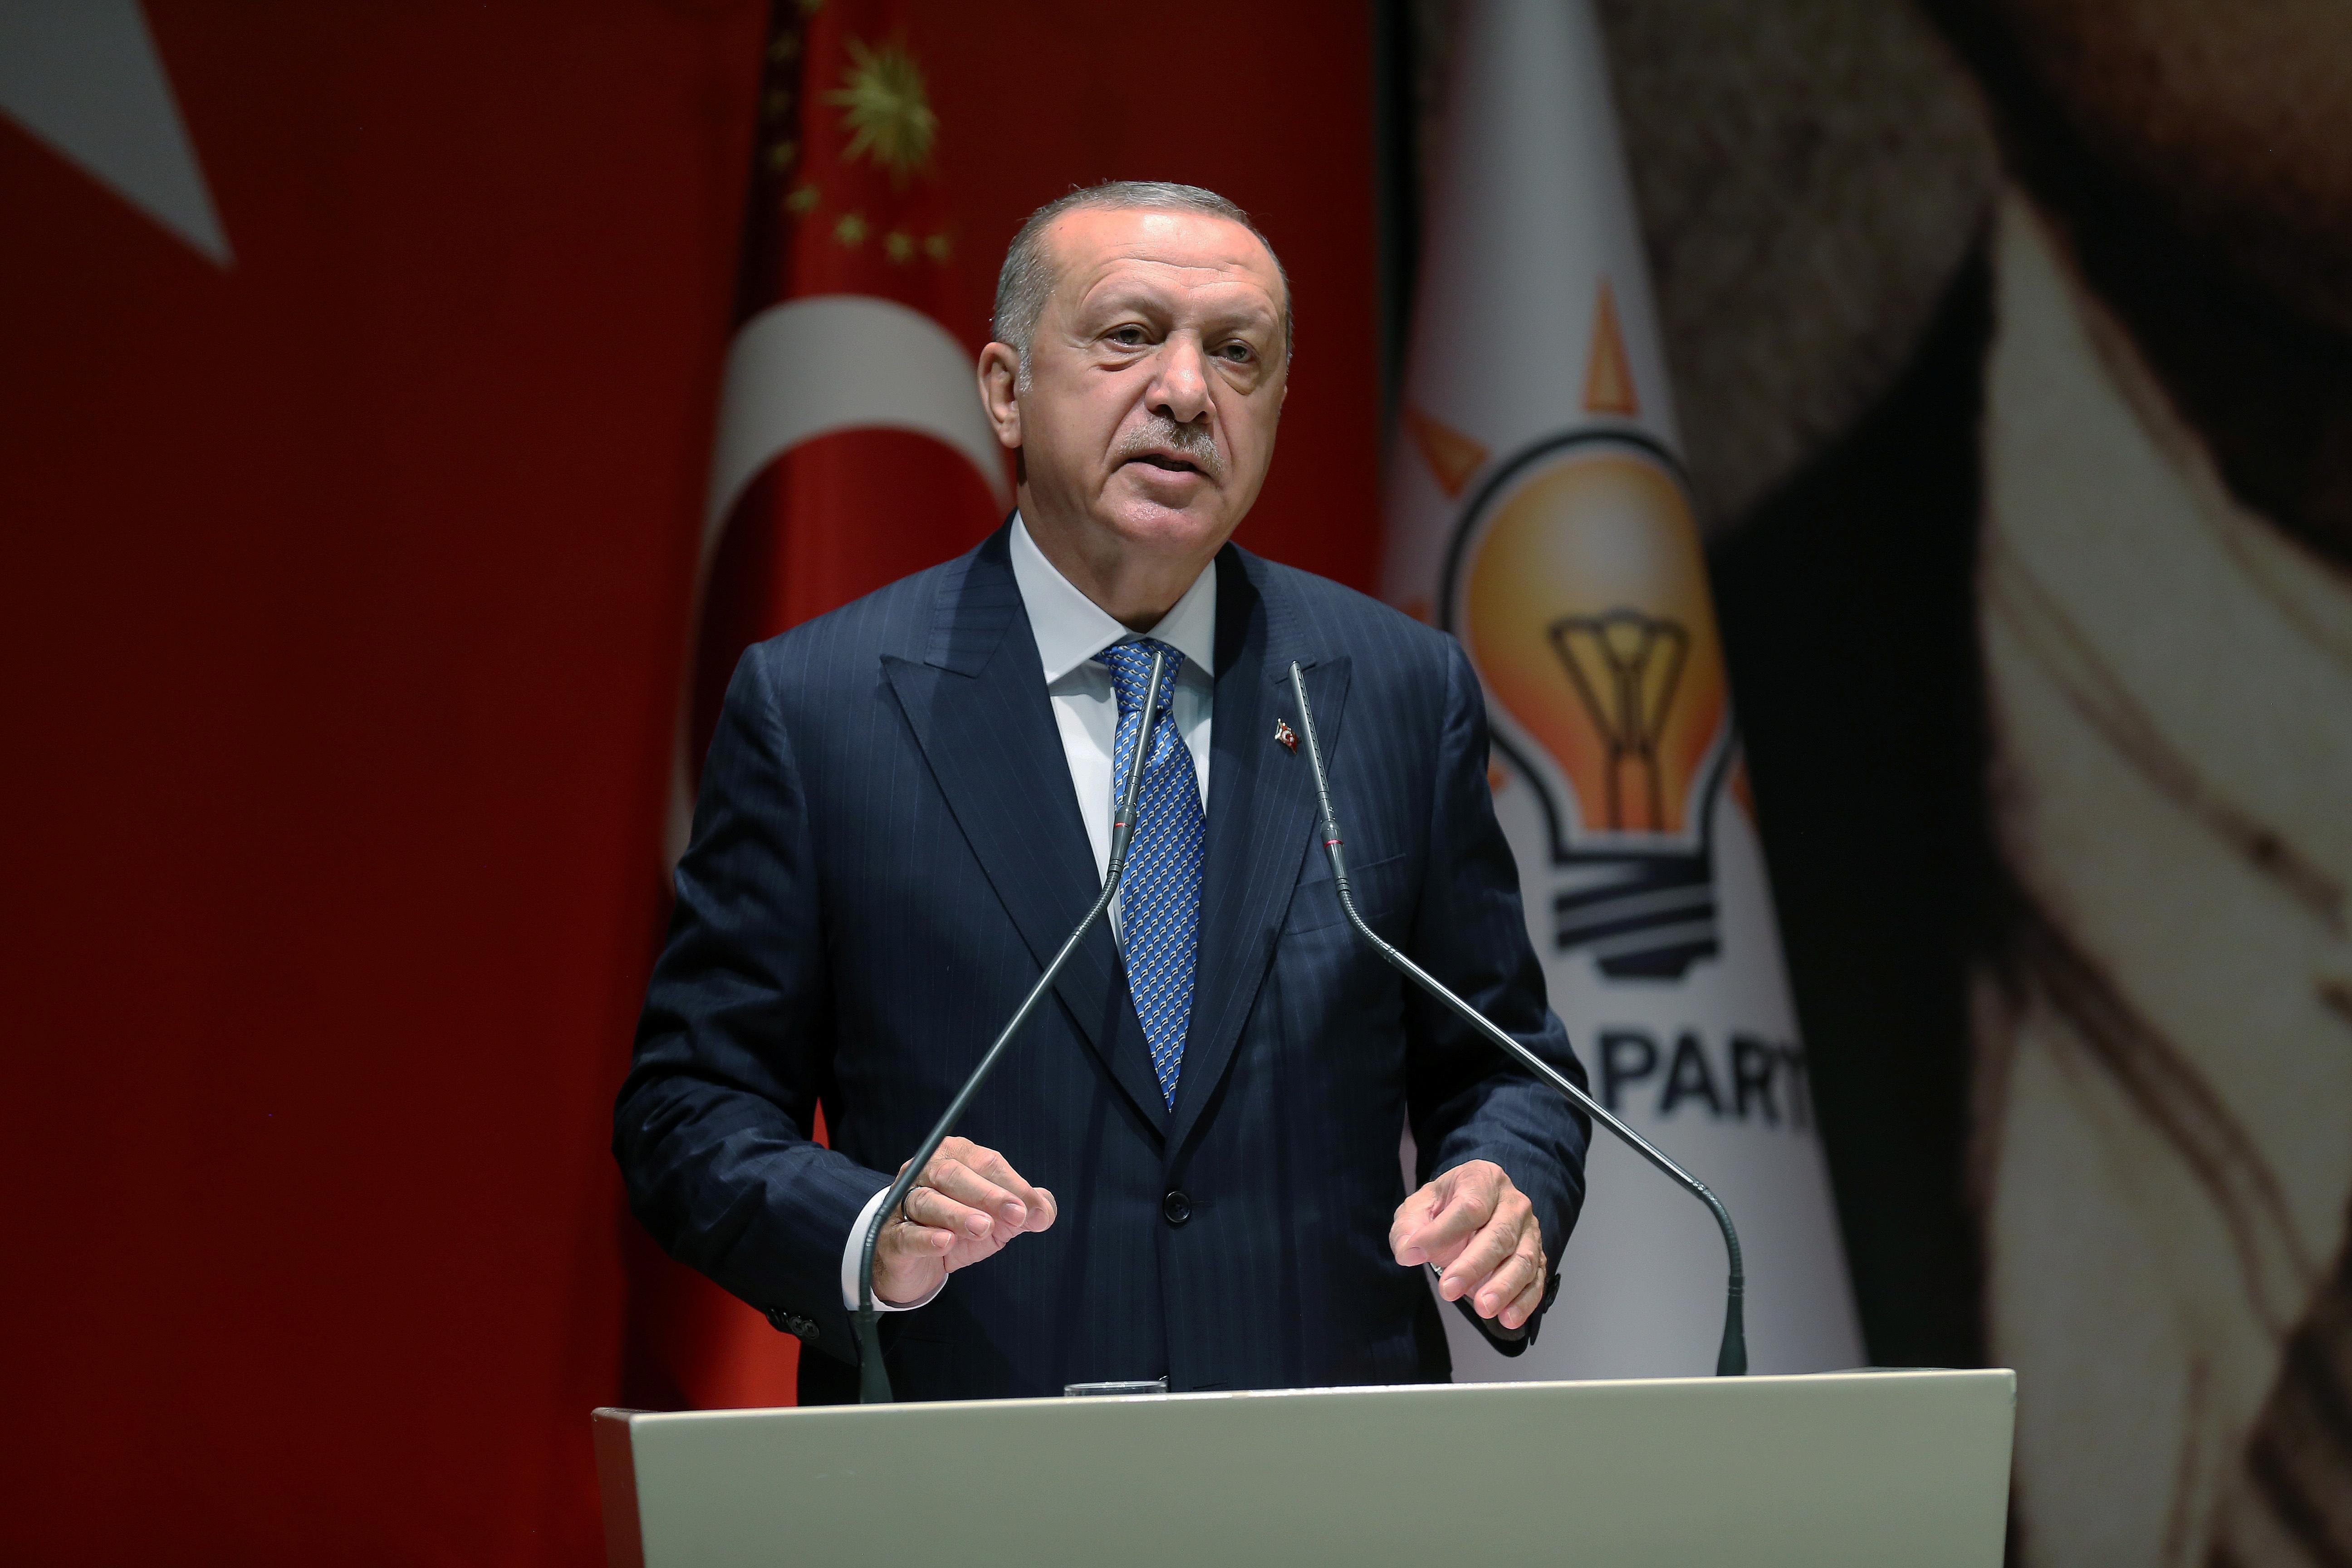 Erdogan says Turkey will destroy militants in north Syria regardless of U.S. talks